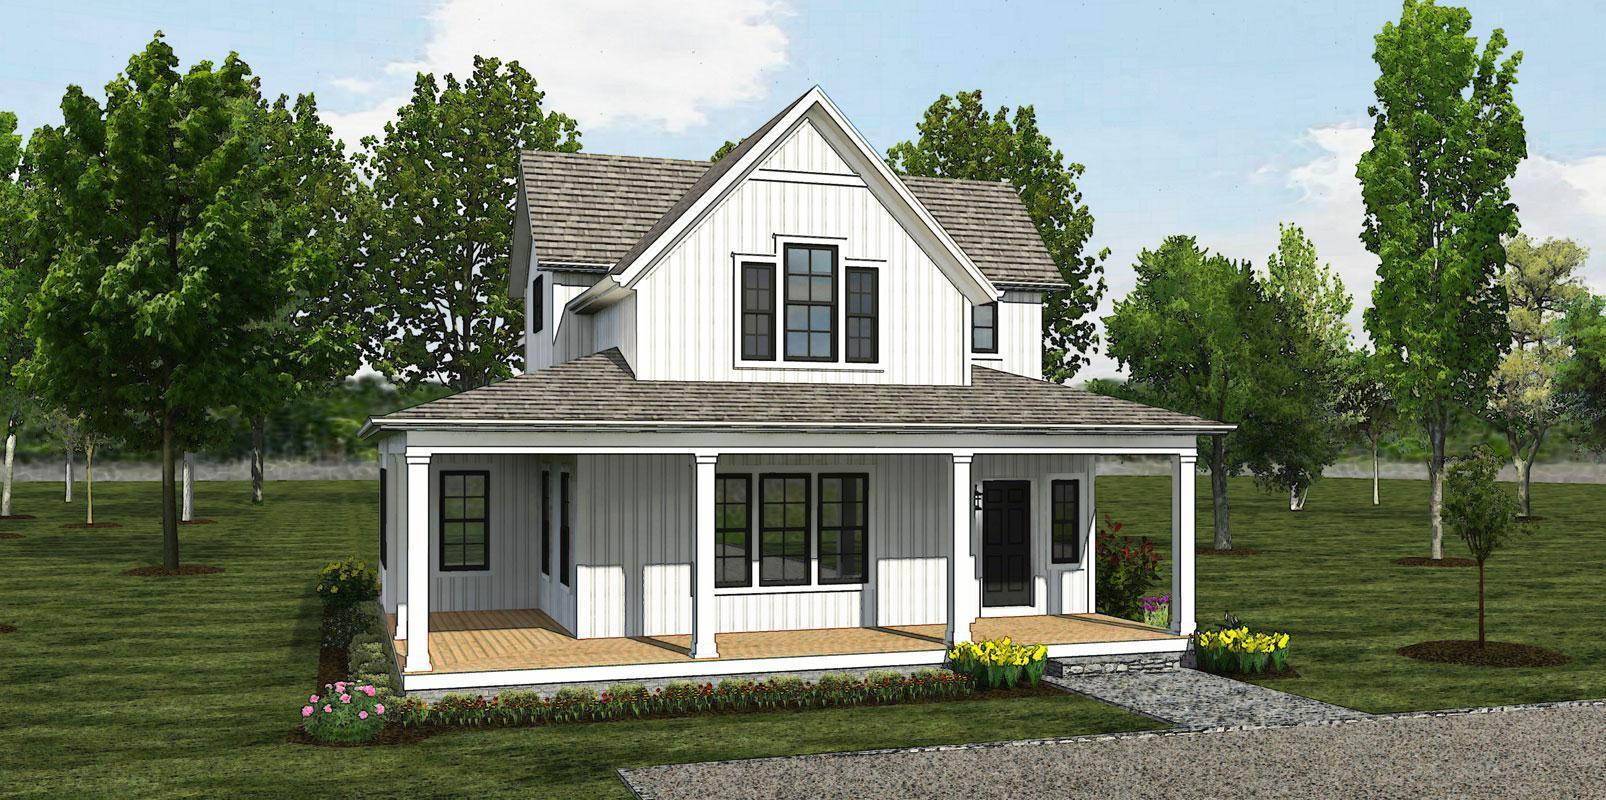 The Veranda - Cottage:Elevation